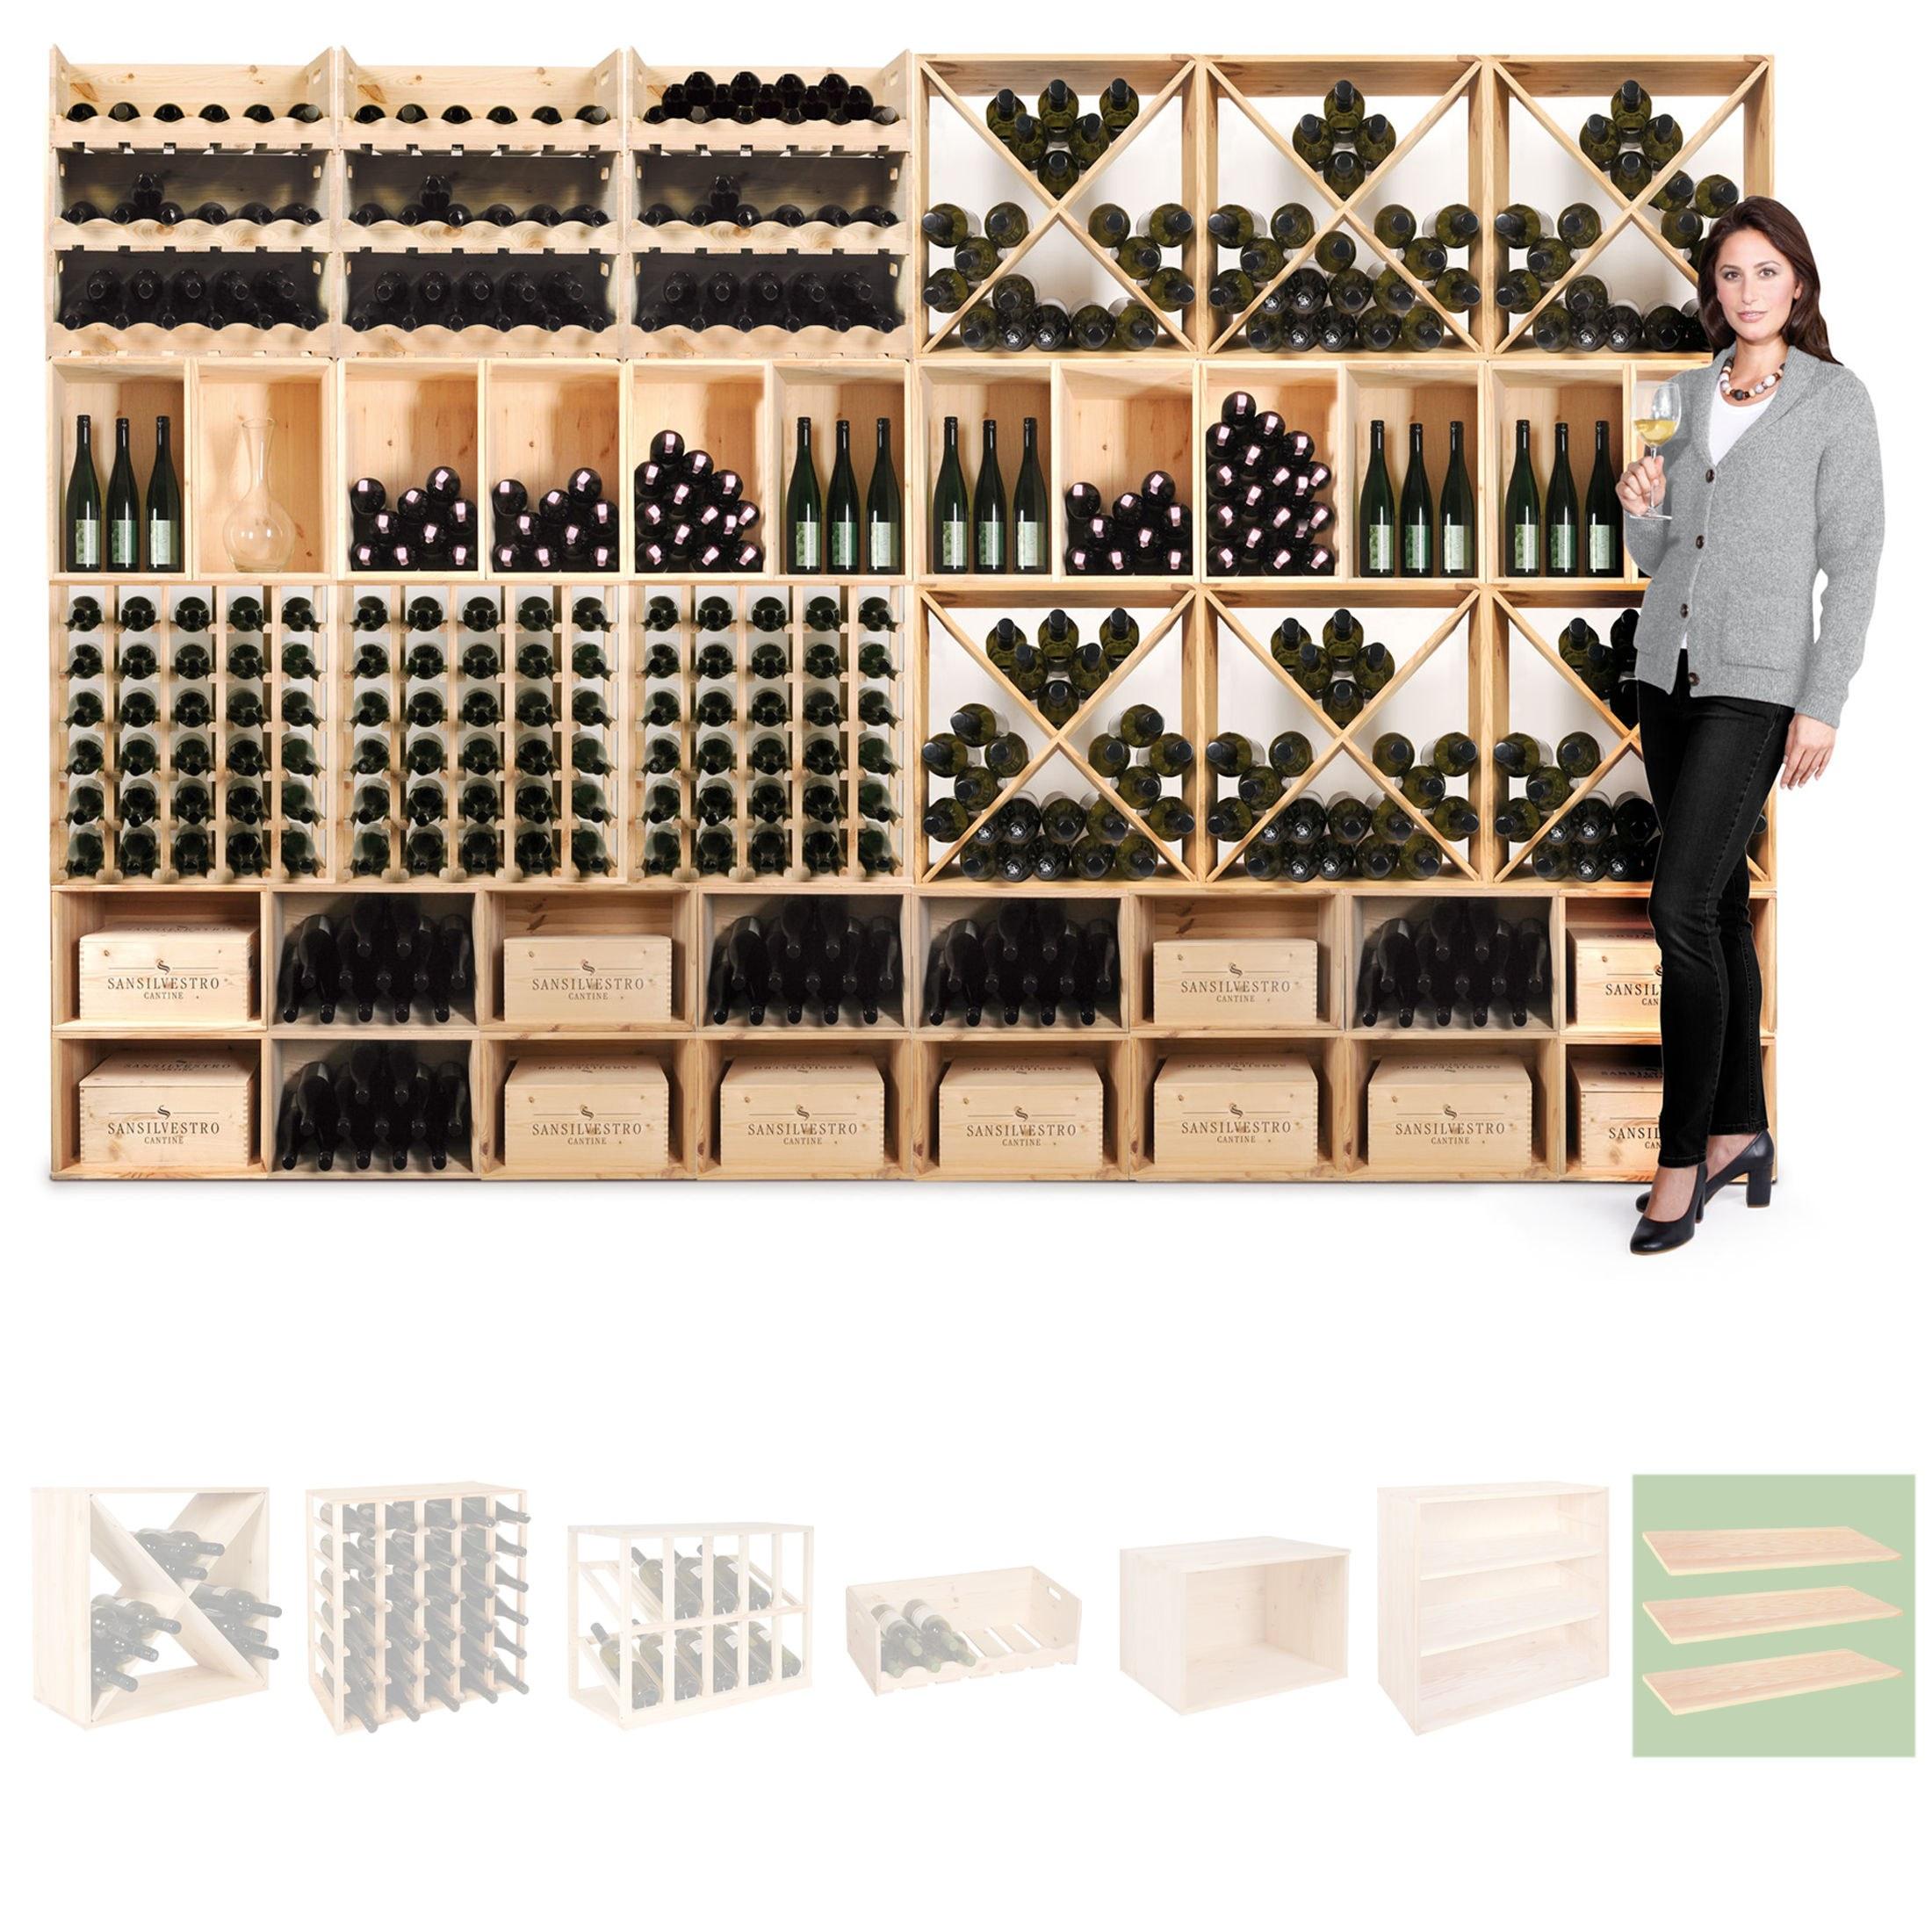 weinregal flaschenregal system vincasa holz kiefer natur stapelbar erweite ebay. Black Bedroom Furniture Sets. Home Design Ideas